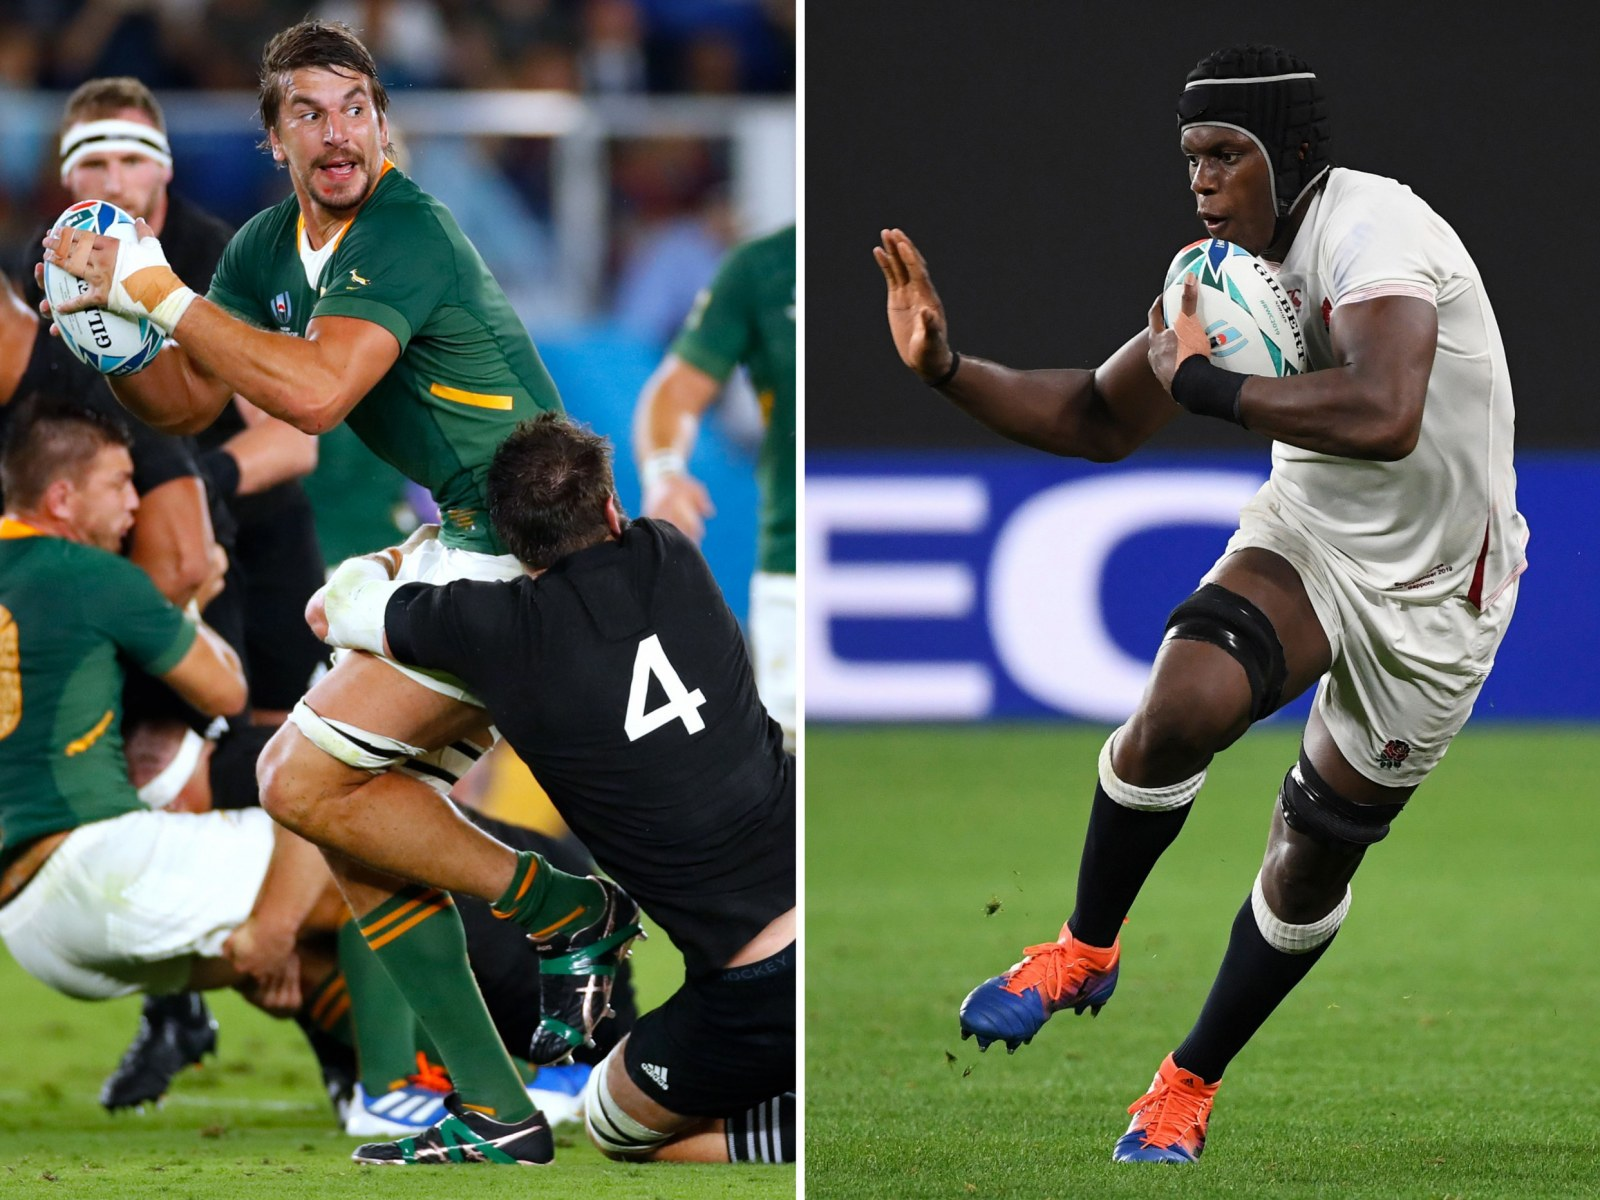 england v south africa rugby live stream free